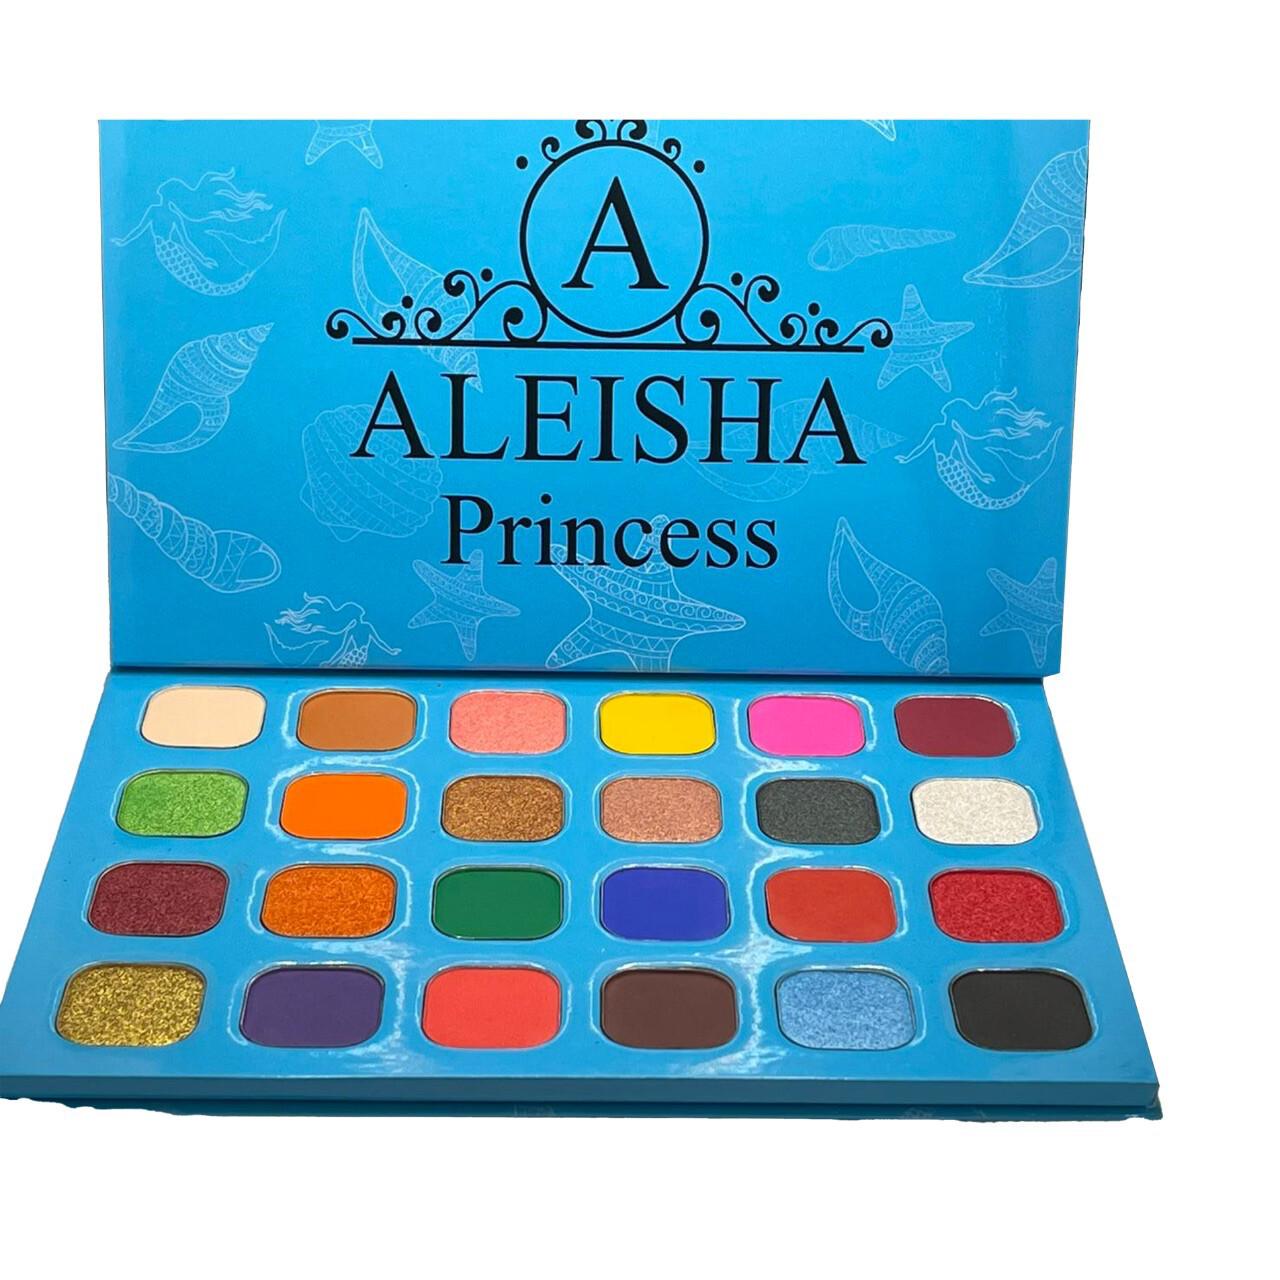 Aleisha Princess Palett